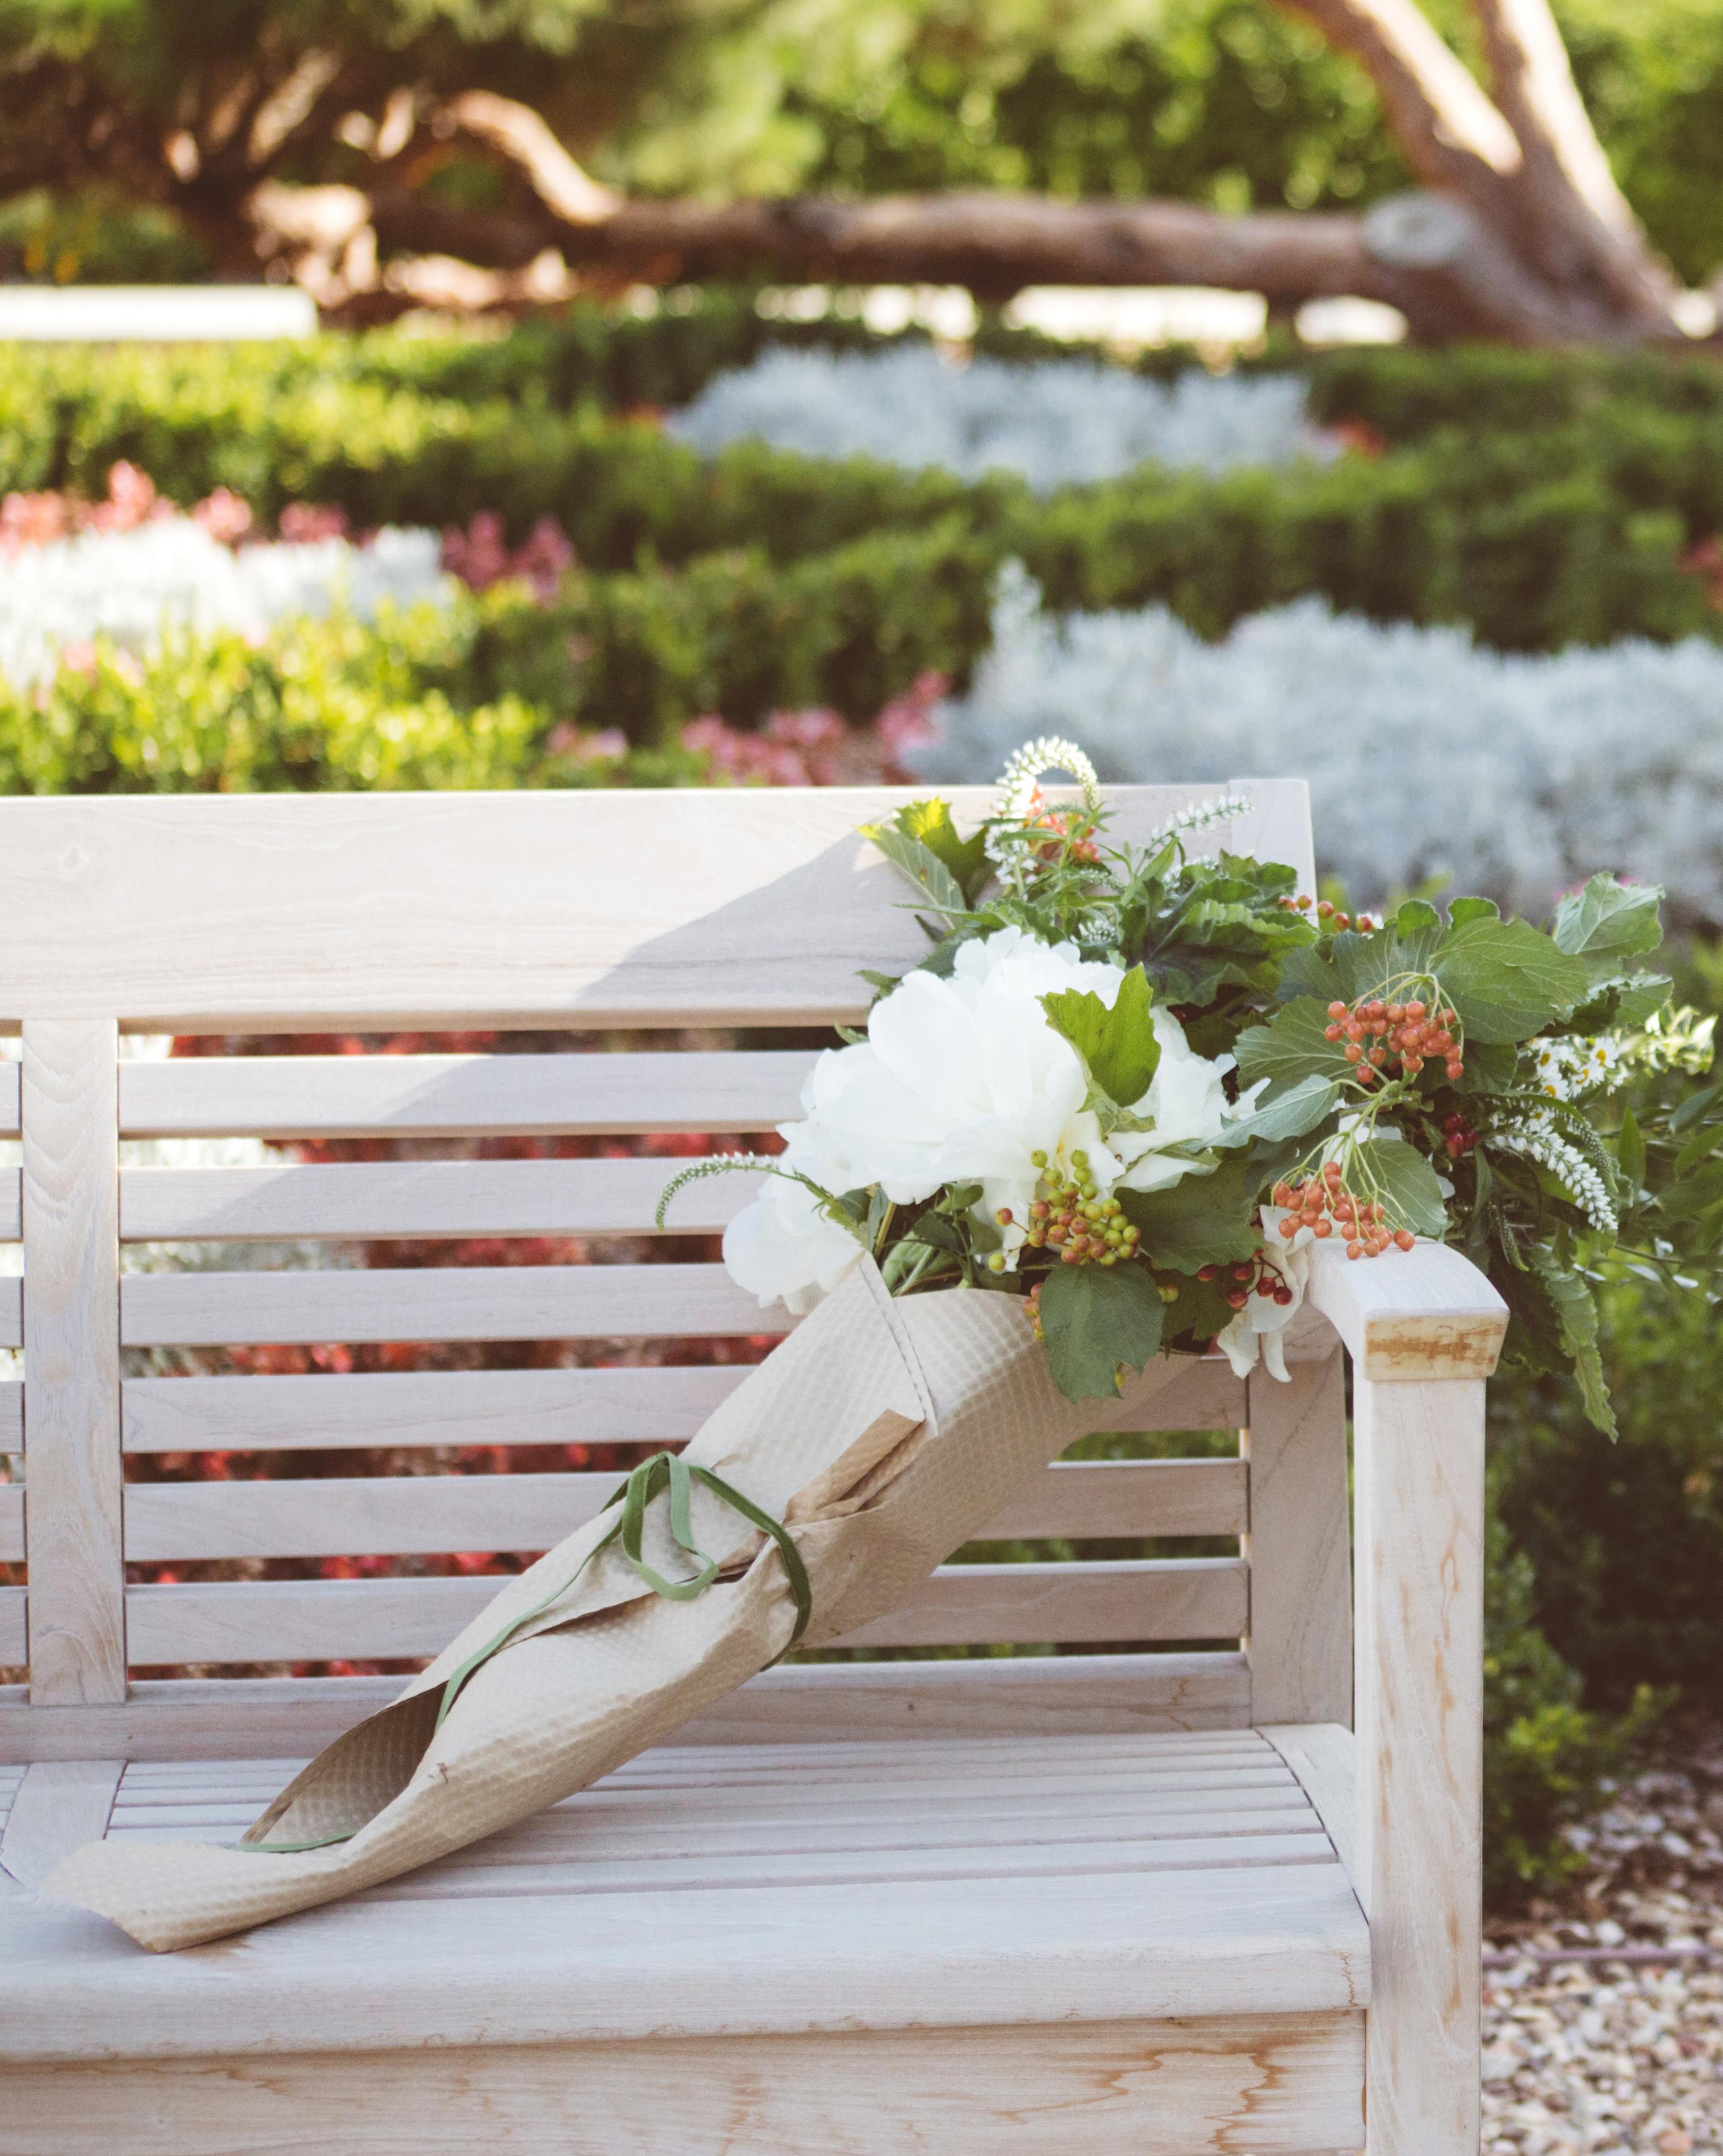 jessie-justin-proposal-flowers-2111-s112467-0915.jpg